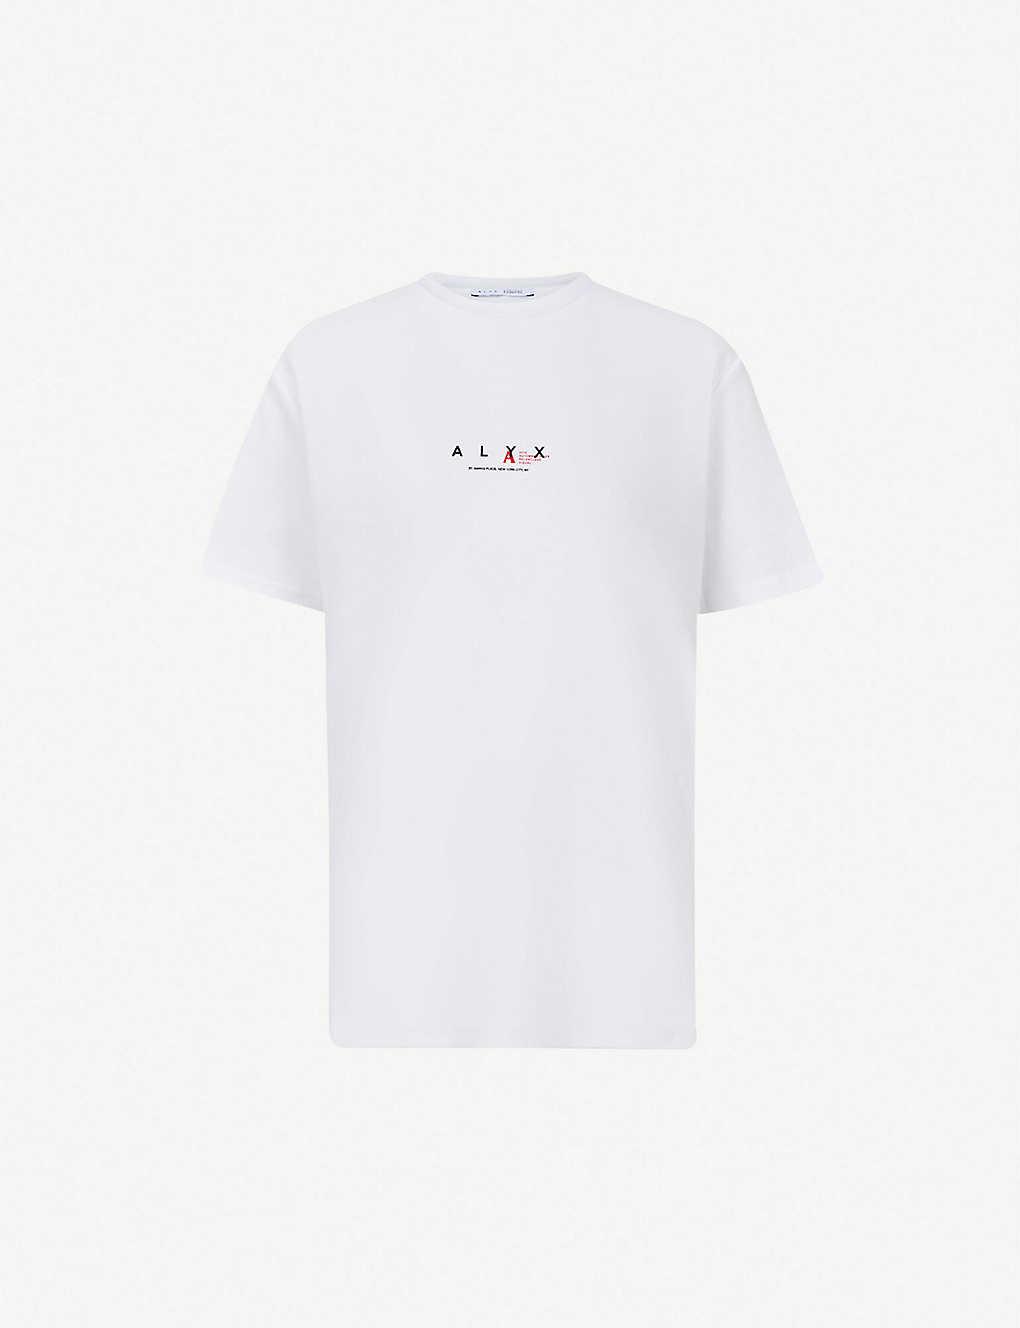 b925af97 1017 ALYX 9SM - Logo-print cotton-blend T-shirt | Selfridges.com